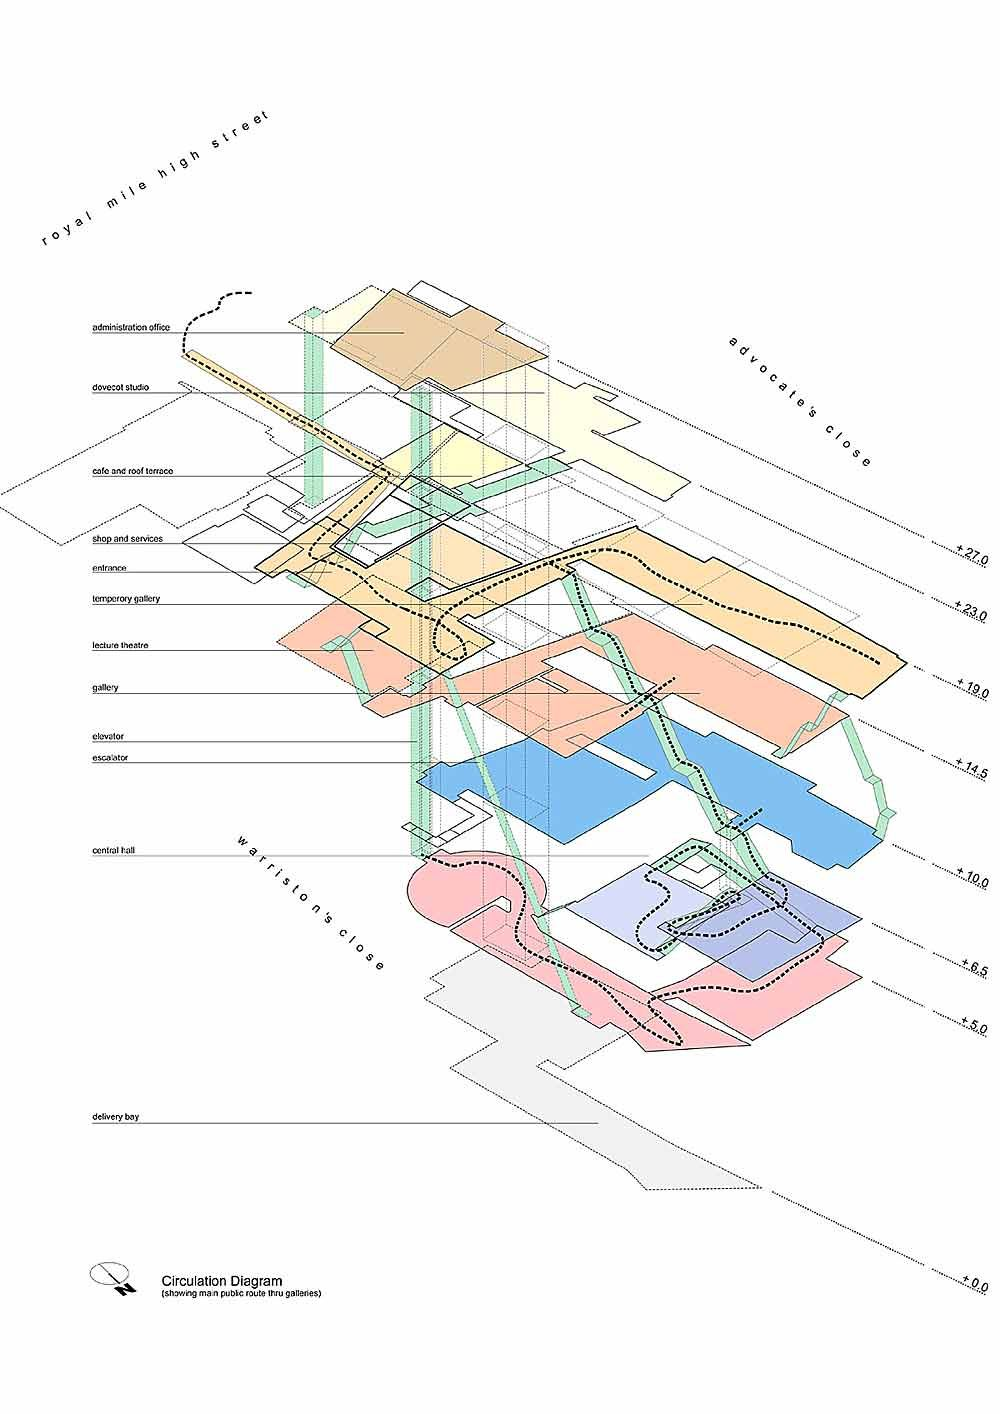 architectural circulation diagram  Google Search